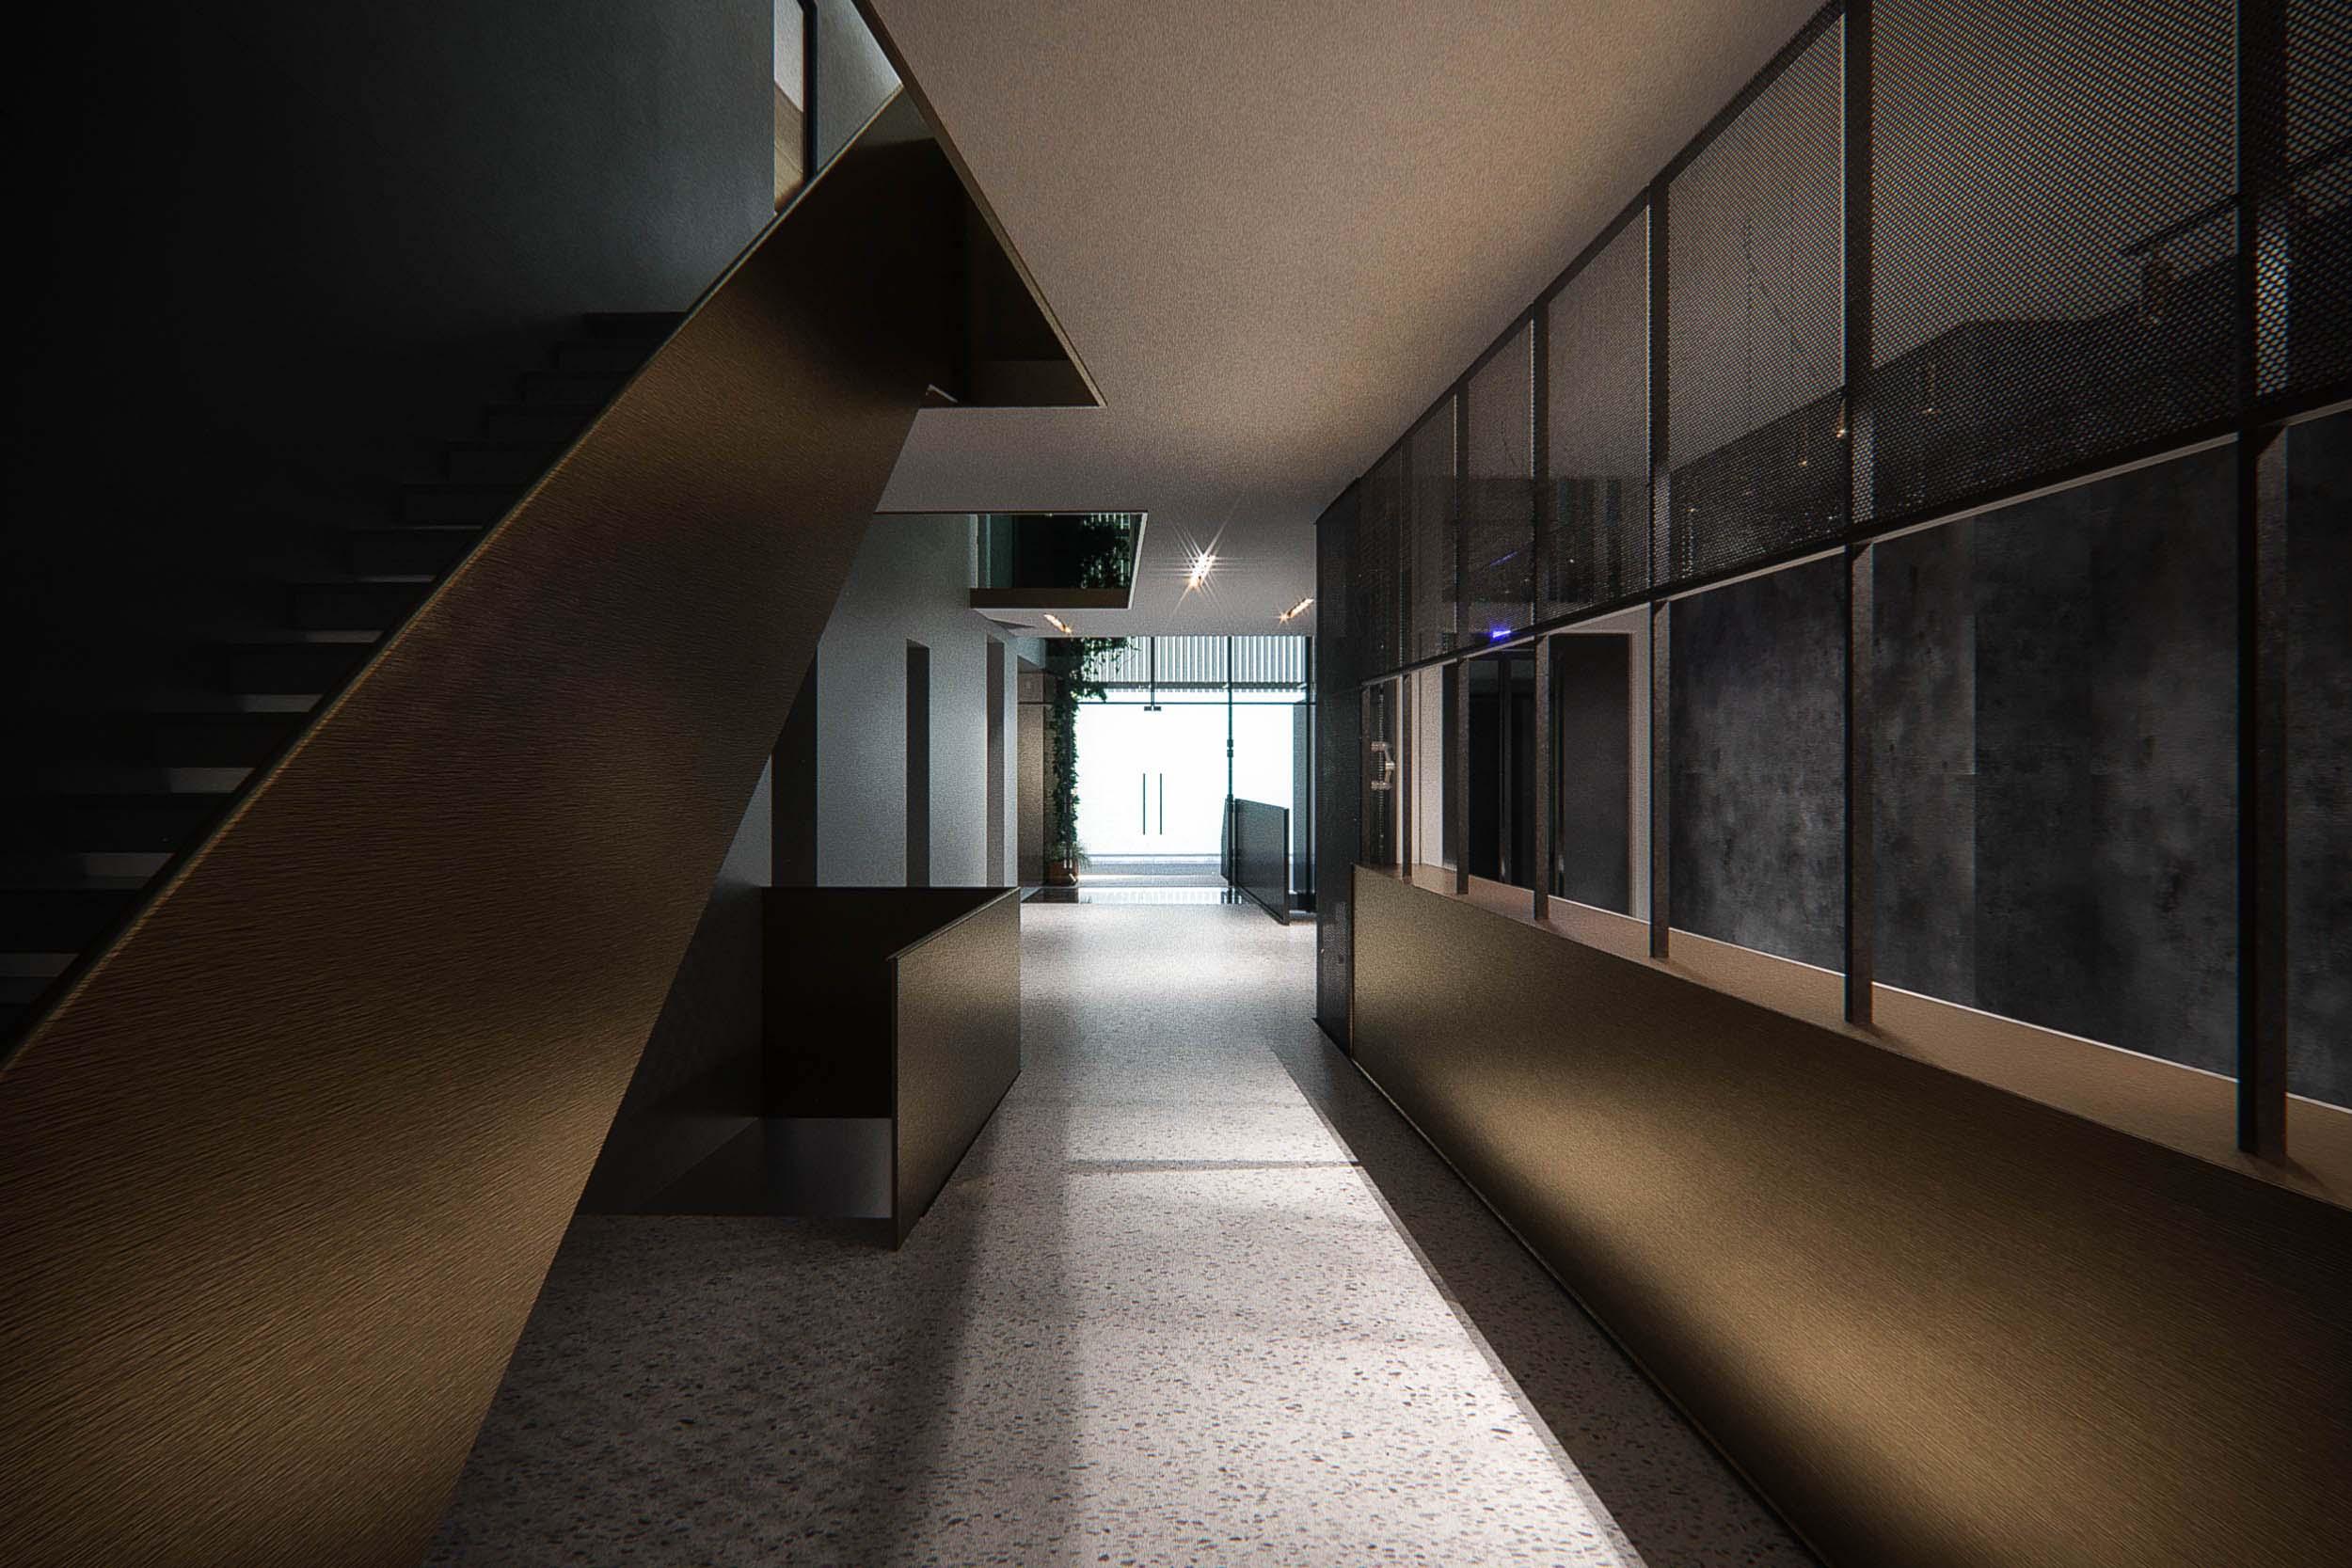 https://dprostudio.com/wp-content/uploads/2020/11/Teatru-Salesjan-_-entrance.jpg